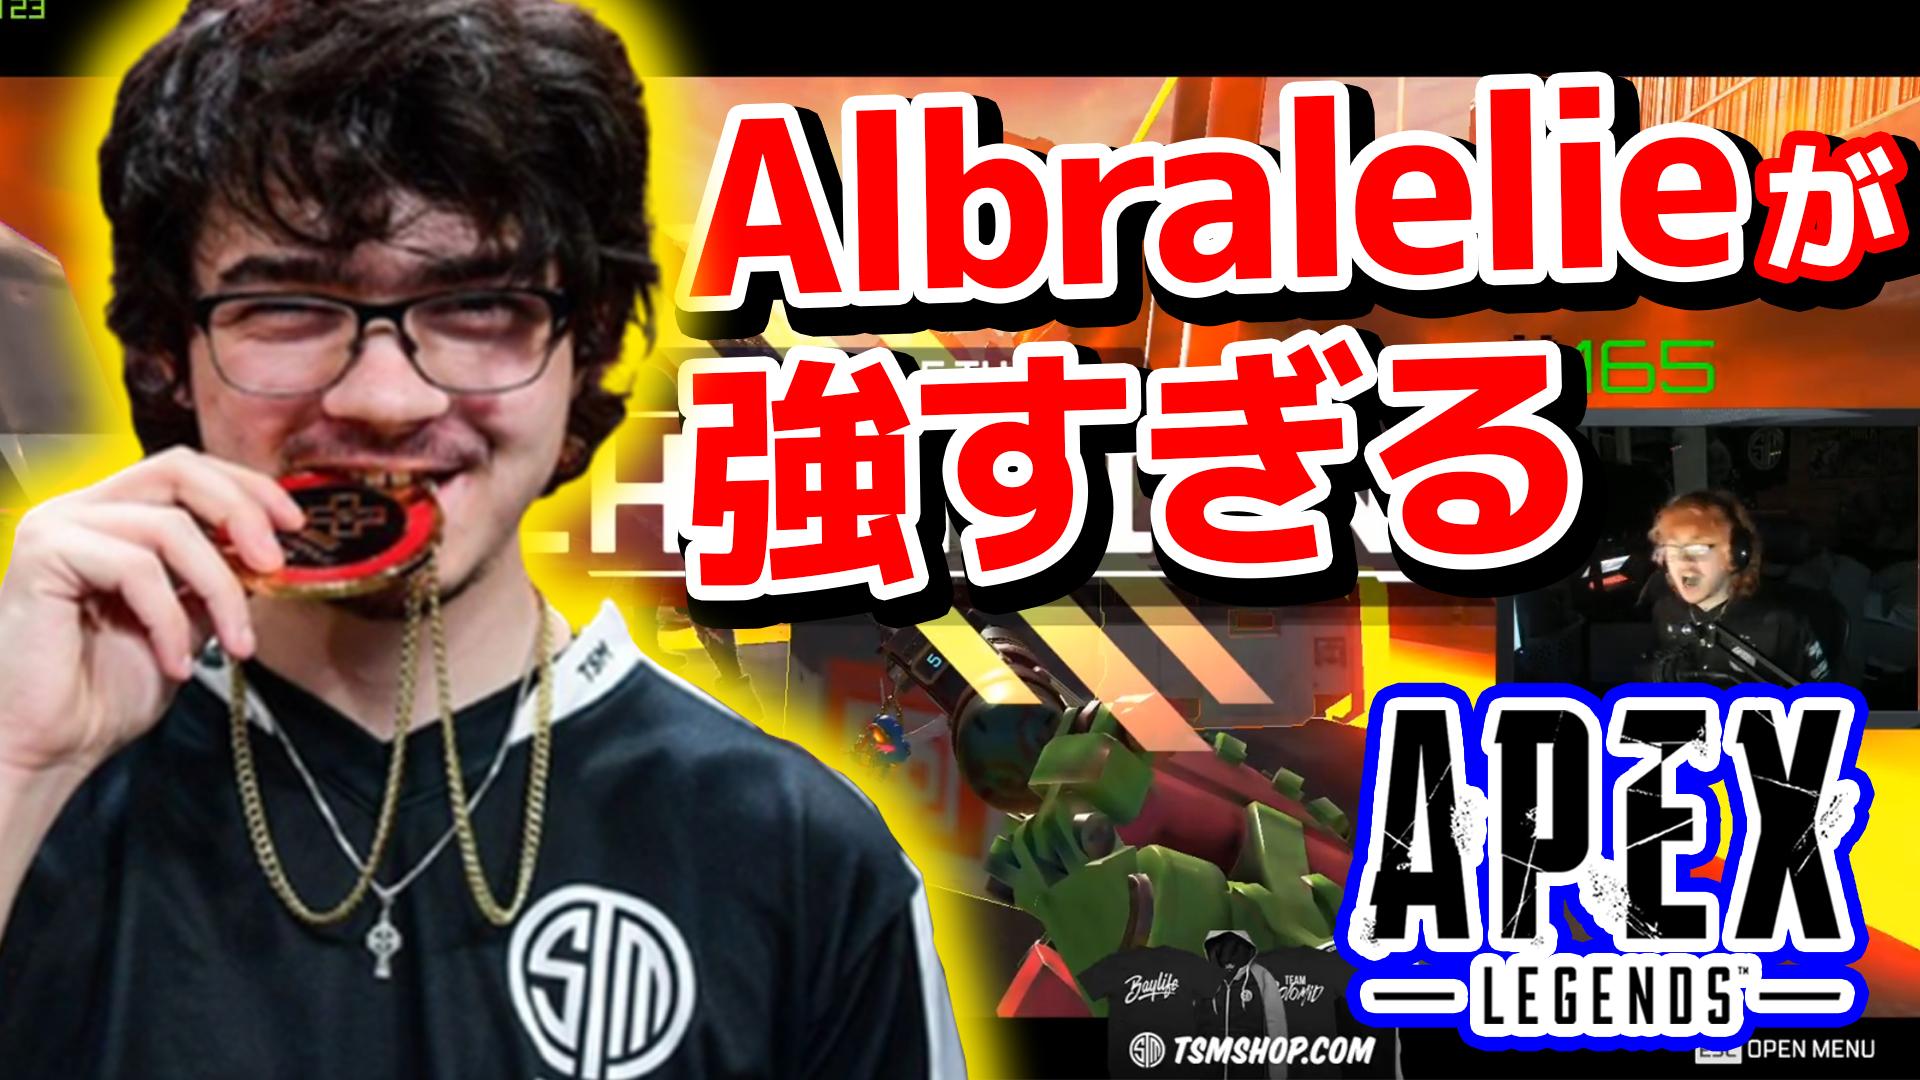 【YouTube】アメリカの最強プロゲーマー「Albralelie」の神プレイまとめ